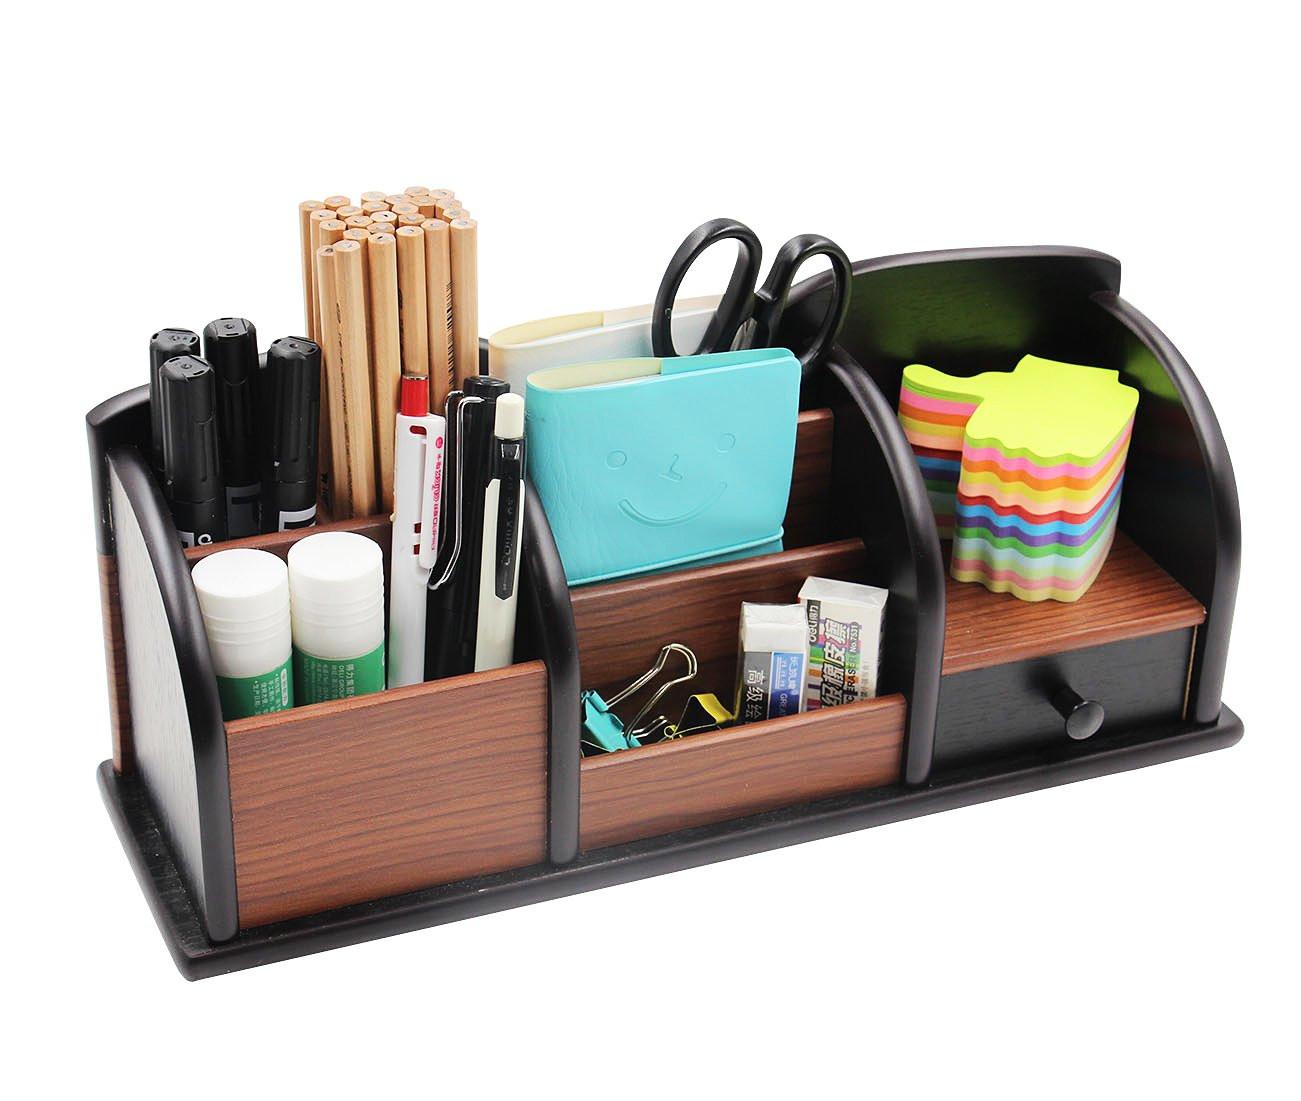 Desk Caddy organizer Unique Pag Fice Supplies Wood Desk organizer Pen Holder